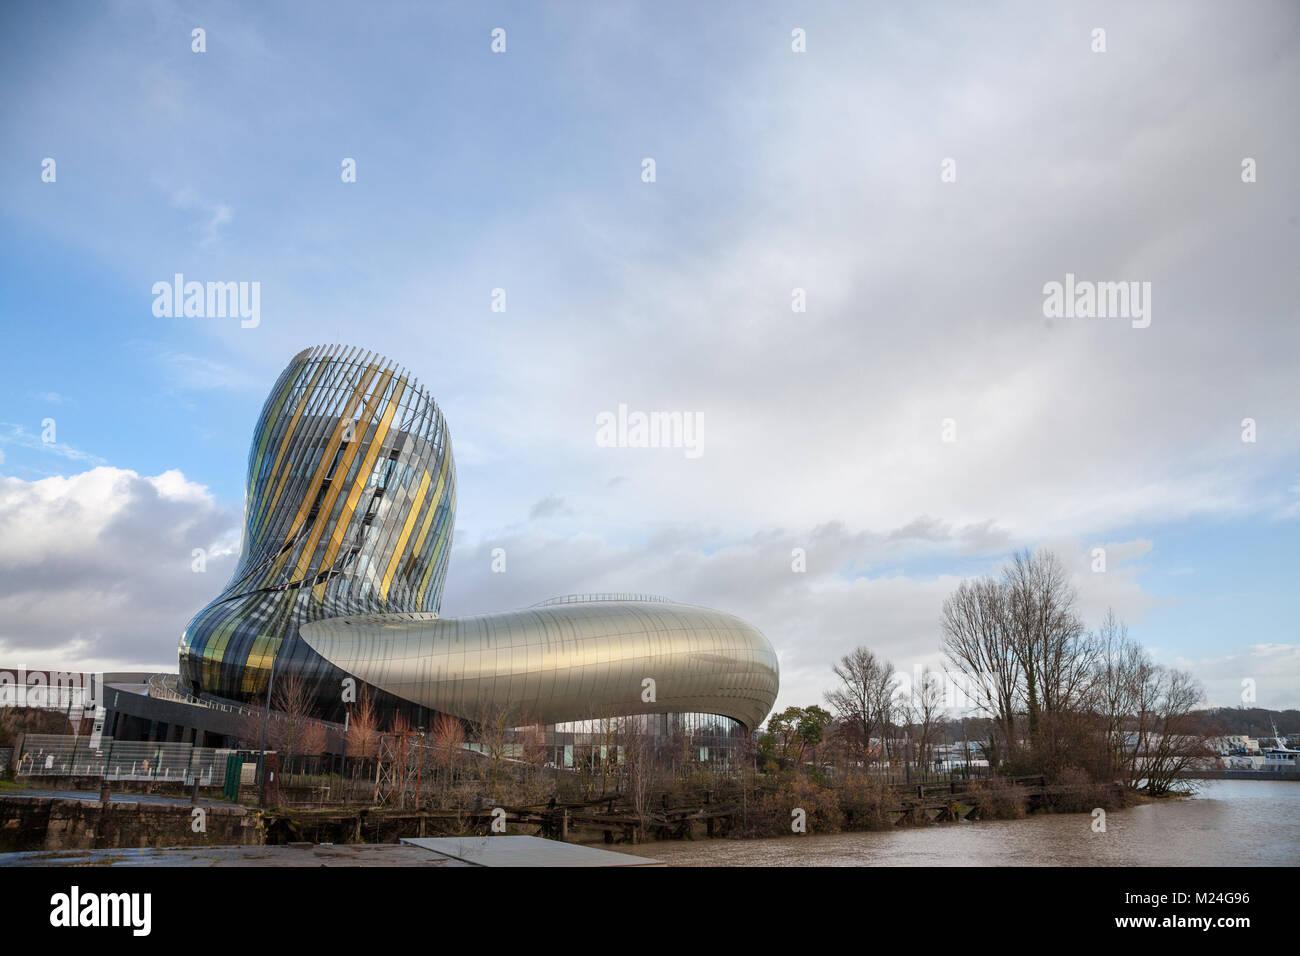 BORDEAUX, FRANCE - DECEMBER 27, 2017: Cite du Vin main building during a sunny afternoon. Cite du Vin (wine city) - Stock Image